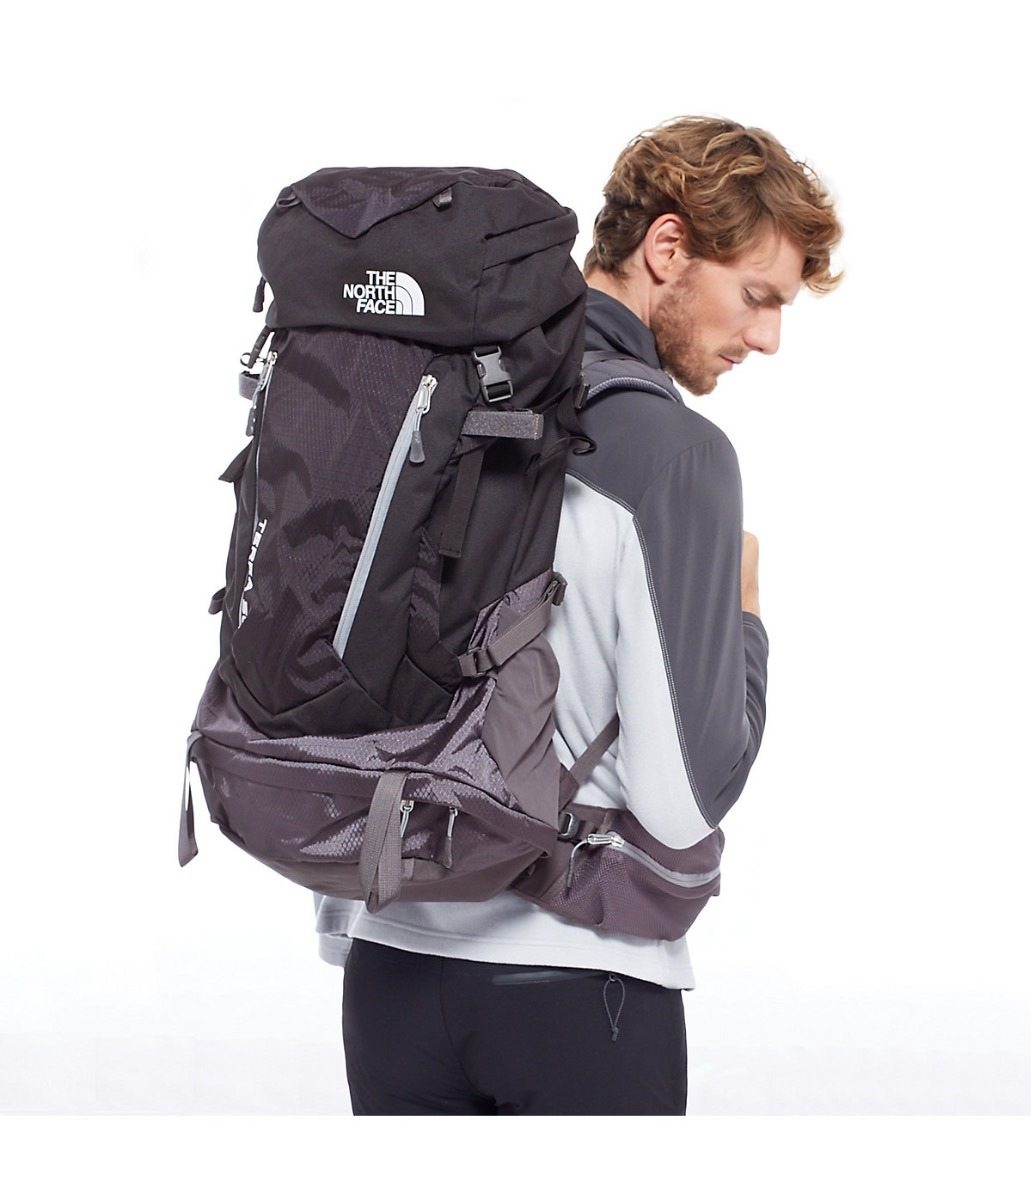 North Terra Face 65 Mochila L The Backpack xoBedC